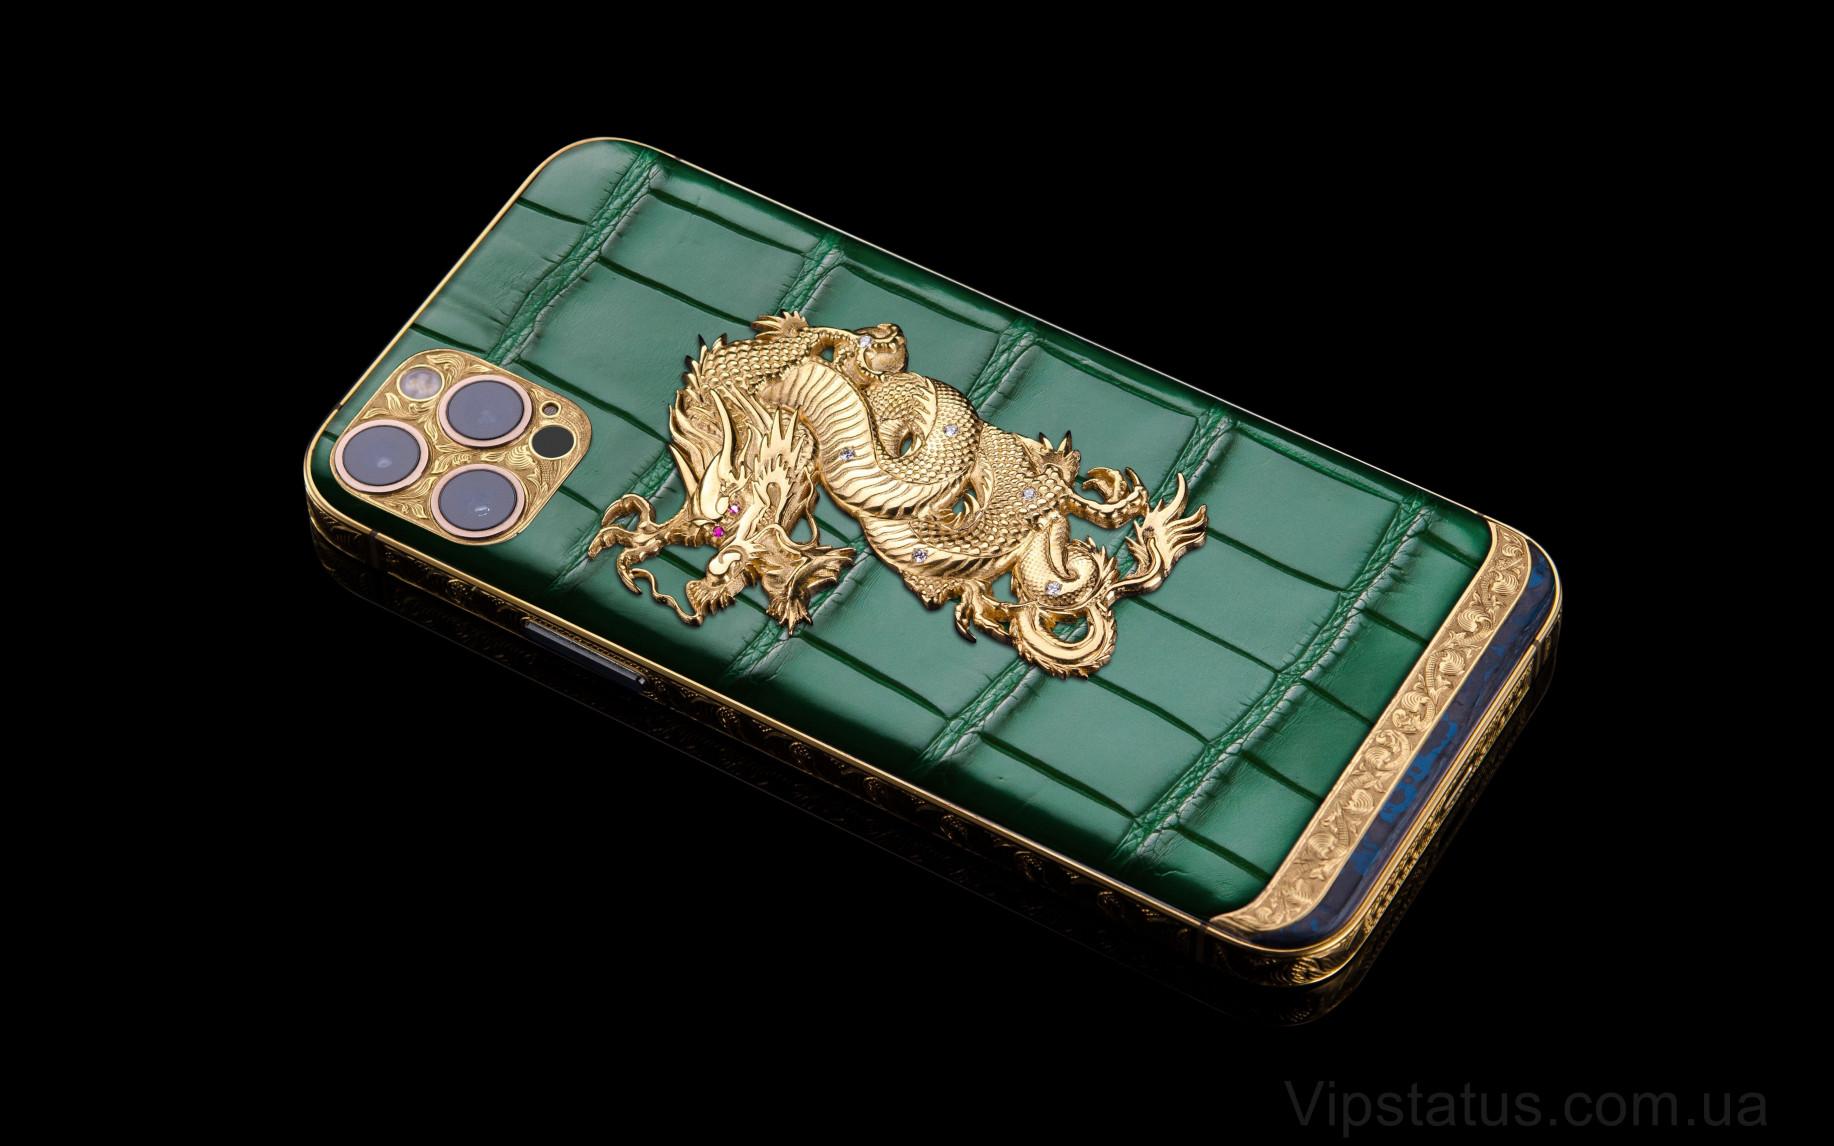 Elite Oriental Dragon IPHONE 12 PRO MAX 512 GB Oriental Dragon IPHONE 12 PRO MAX 512 GB image 25